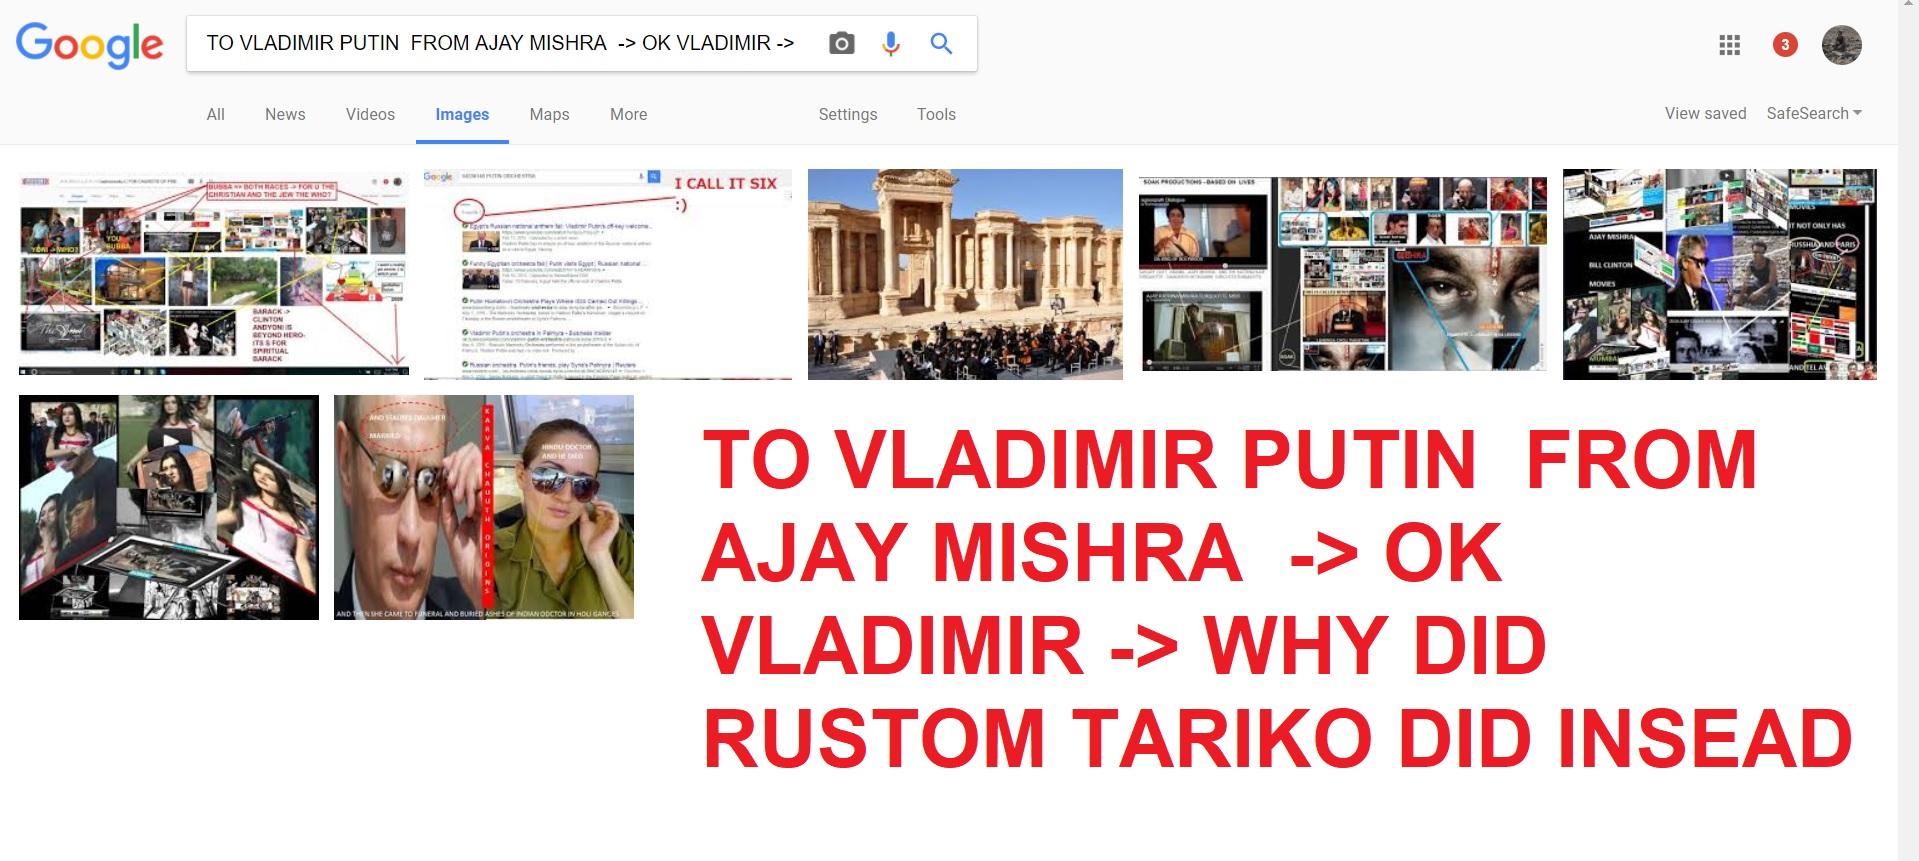 TO VLADIMIR PUTIN FROM AJAY MISHRA OK VLADIMIR WHY DID RUSTOM TARIKO DID INSEAD